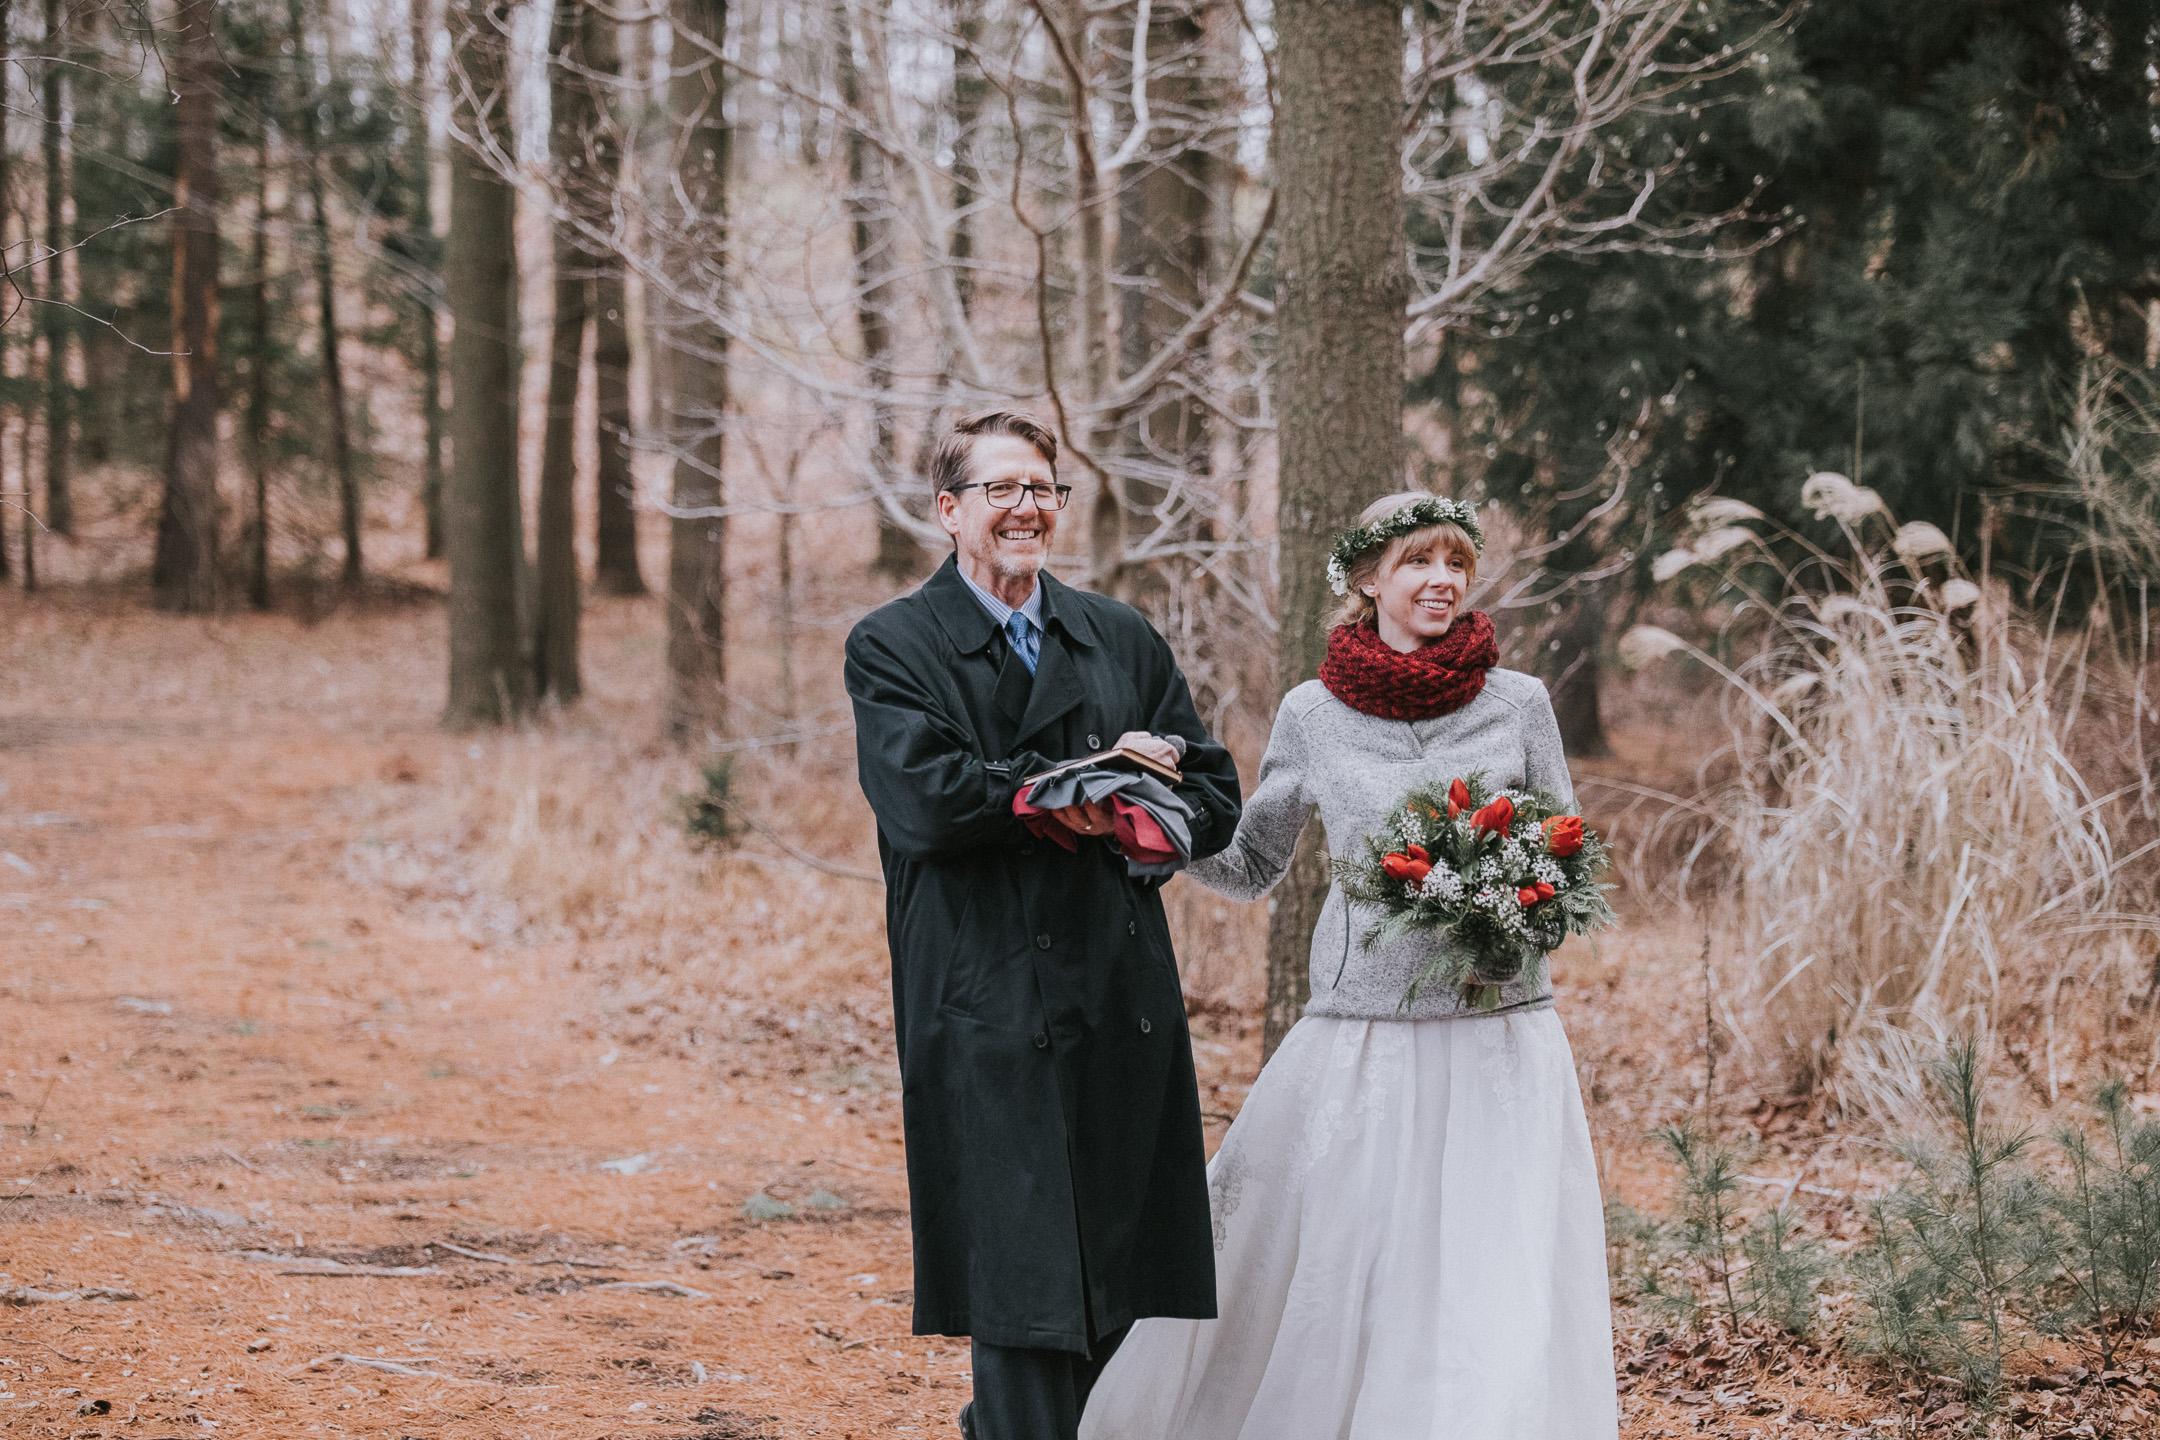 thurmont wedding photographer (9 of 38).jpg